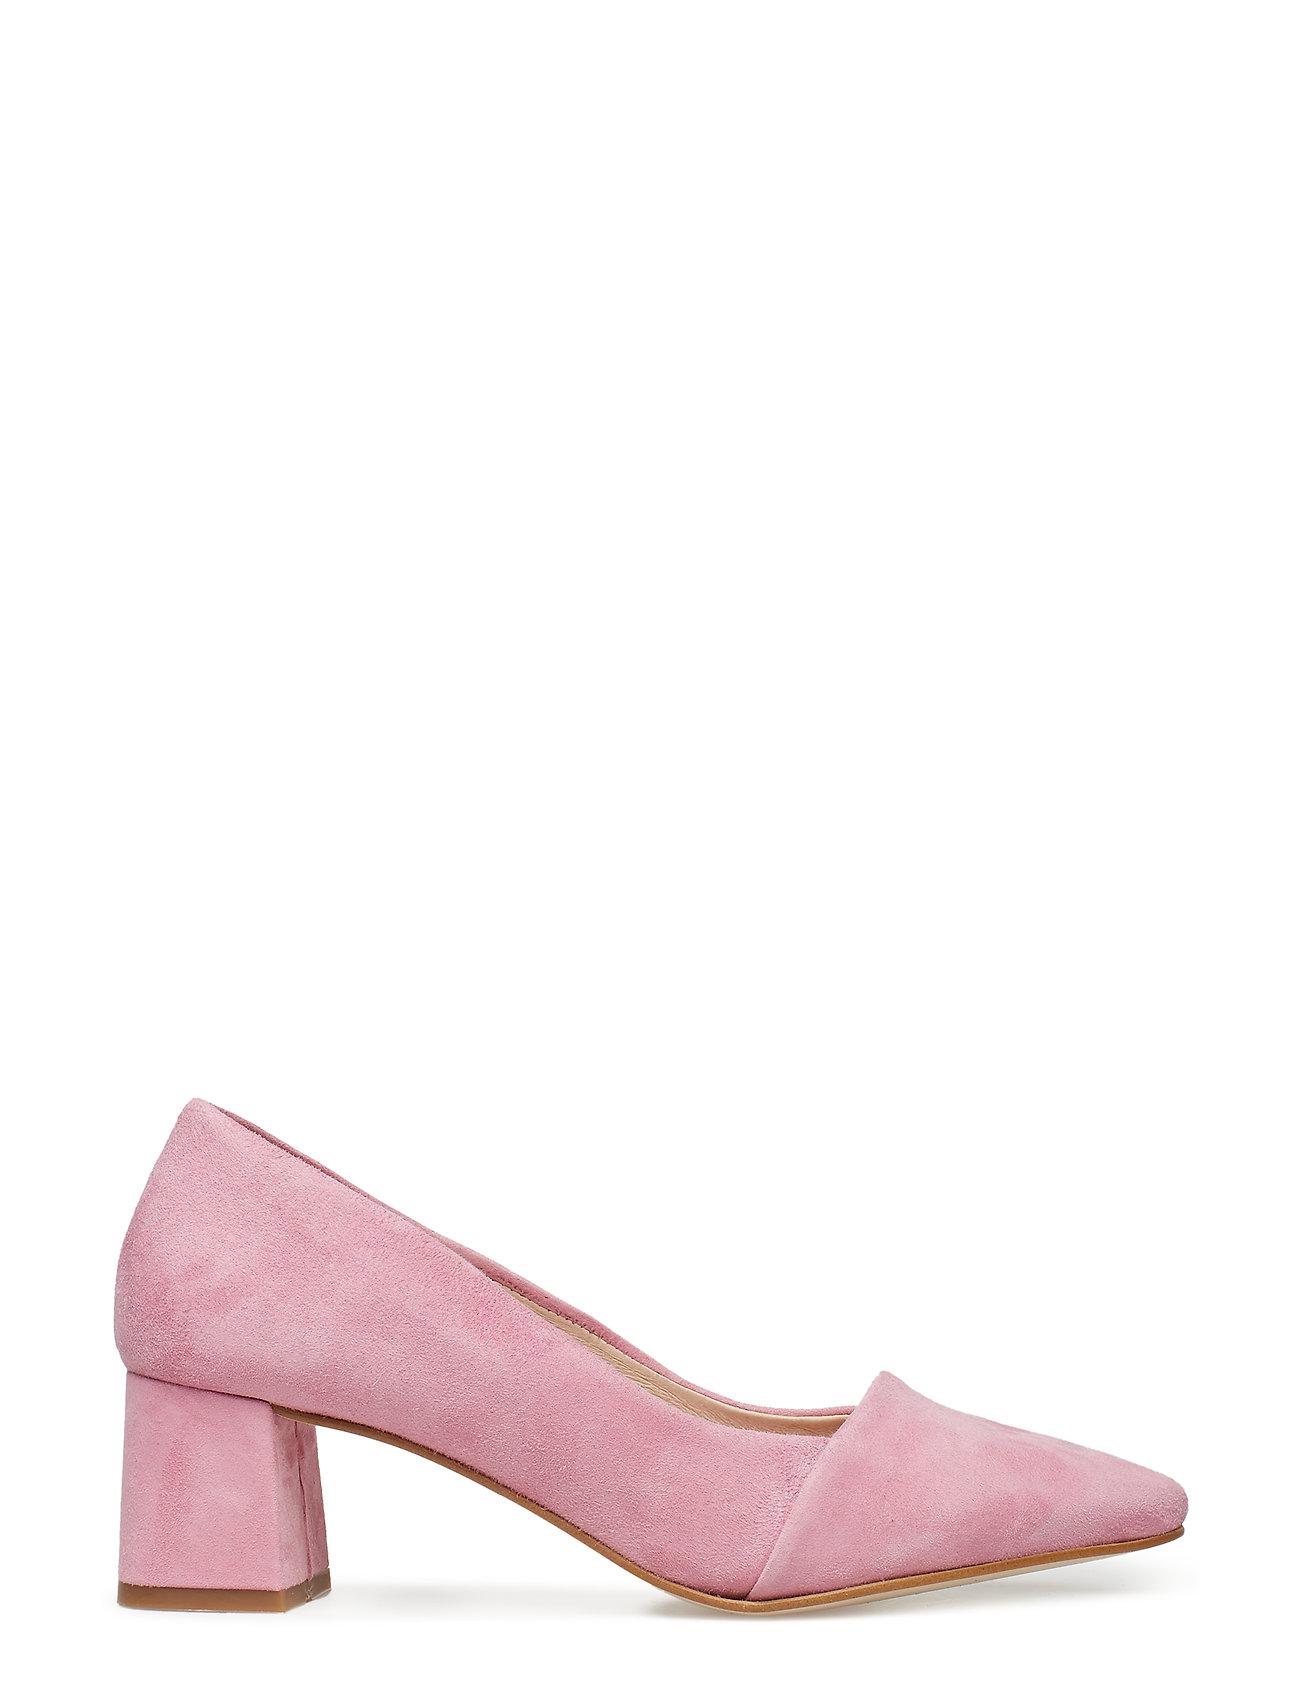 Bear The Allison Slight Slight PinkShoe Allison PinkShoe UVqpSMz